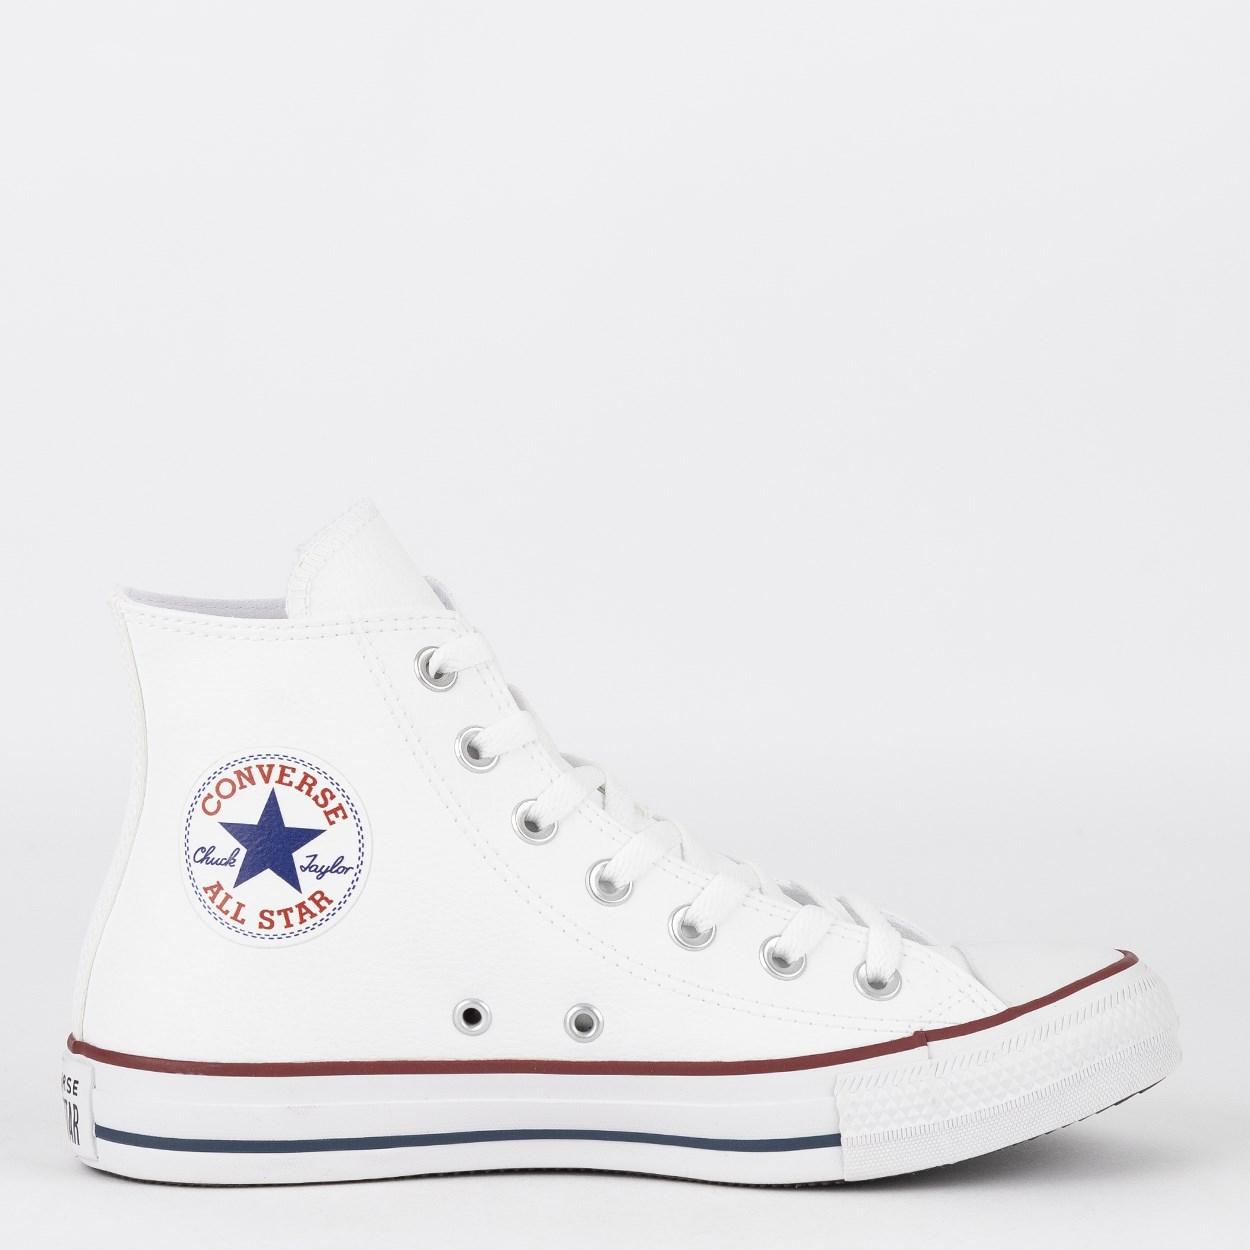 Tênis Bebê Converse All Star Chuck Taylor Cano Alto Branco